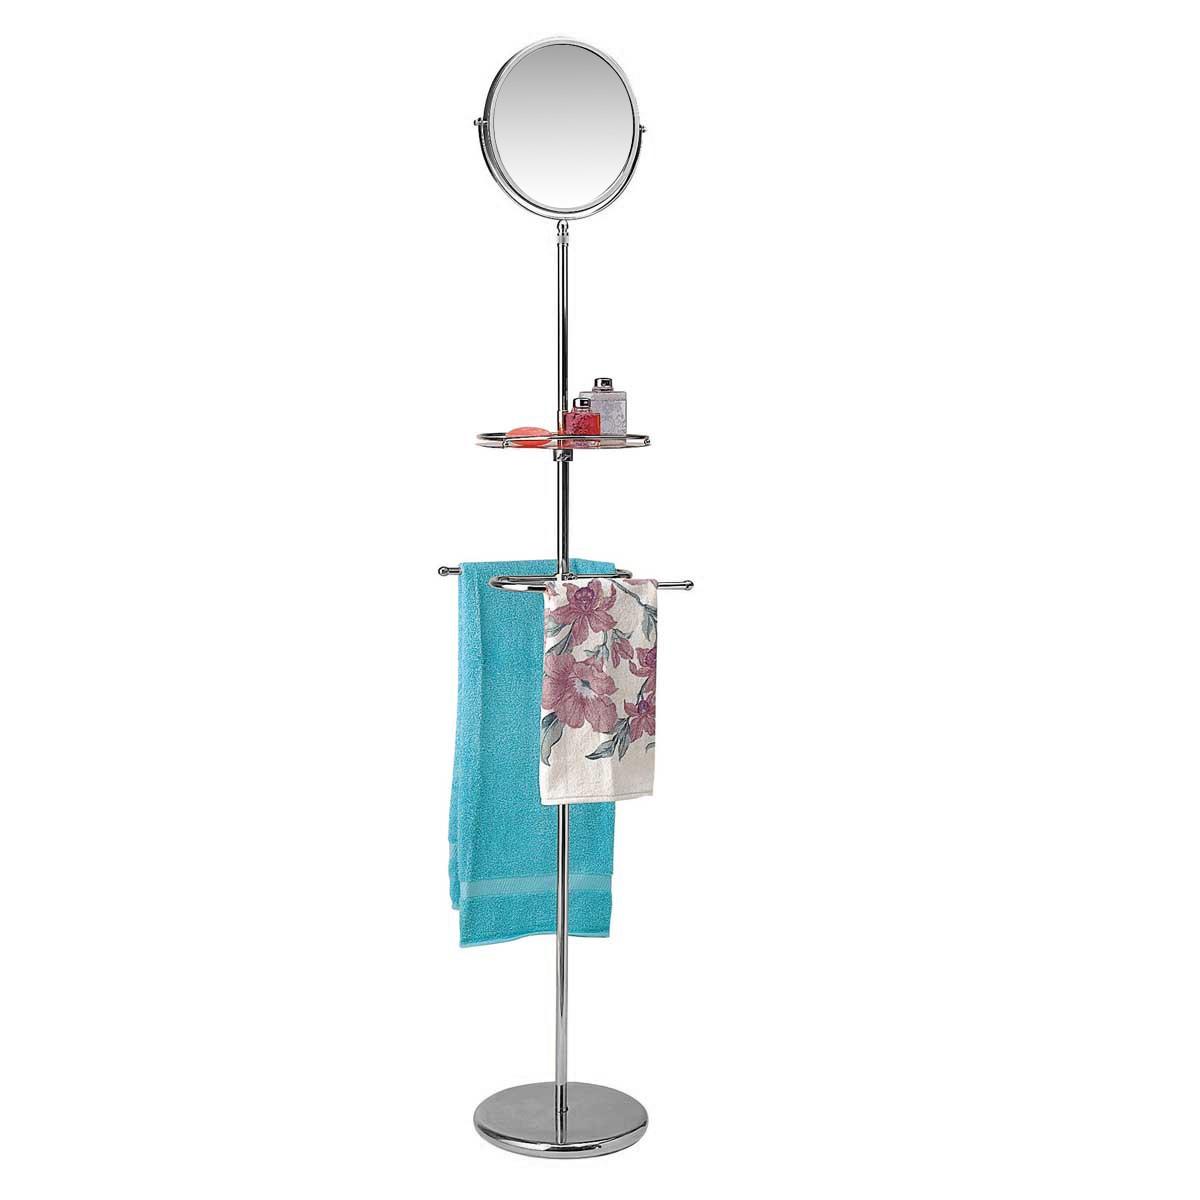 Victorian Vintage Brass Standing Mirror Shelf Towel Rack